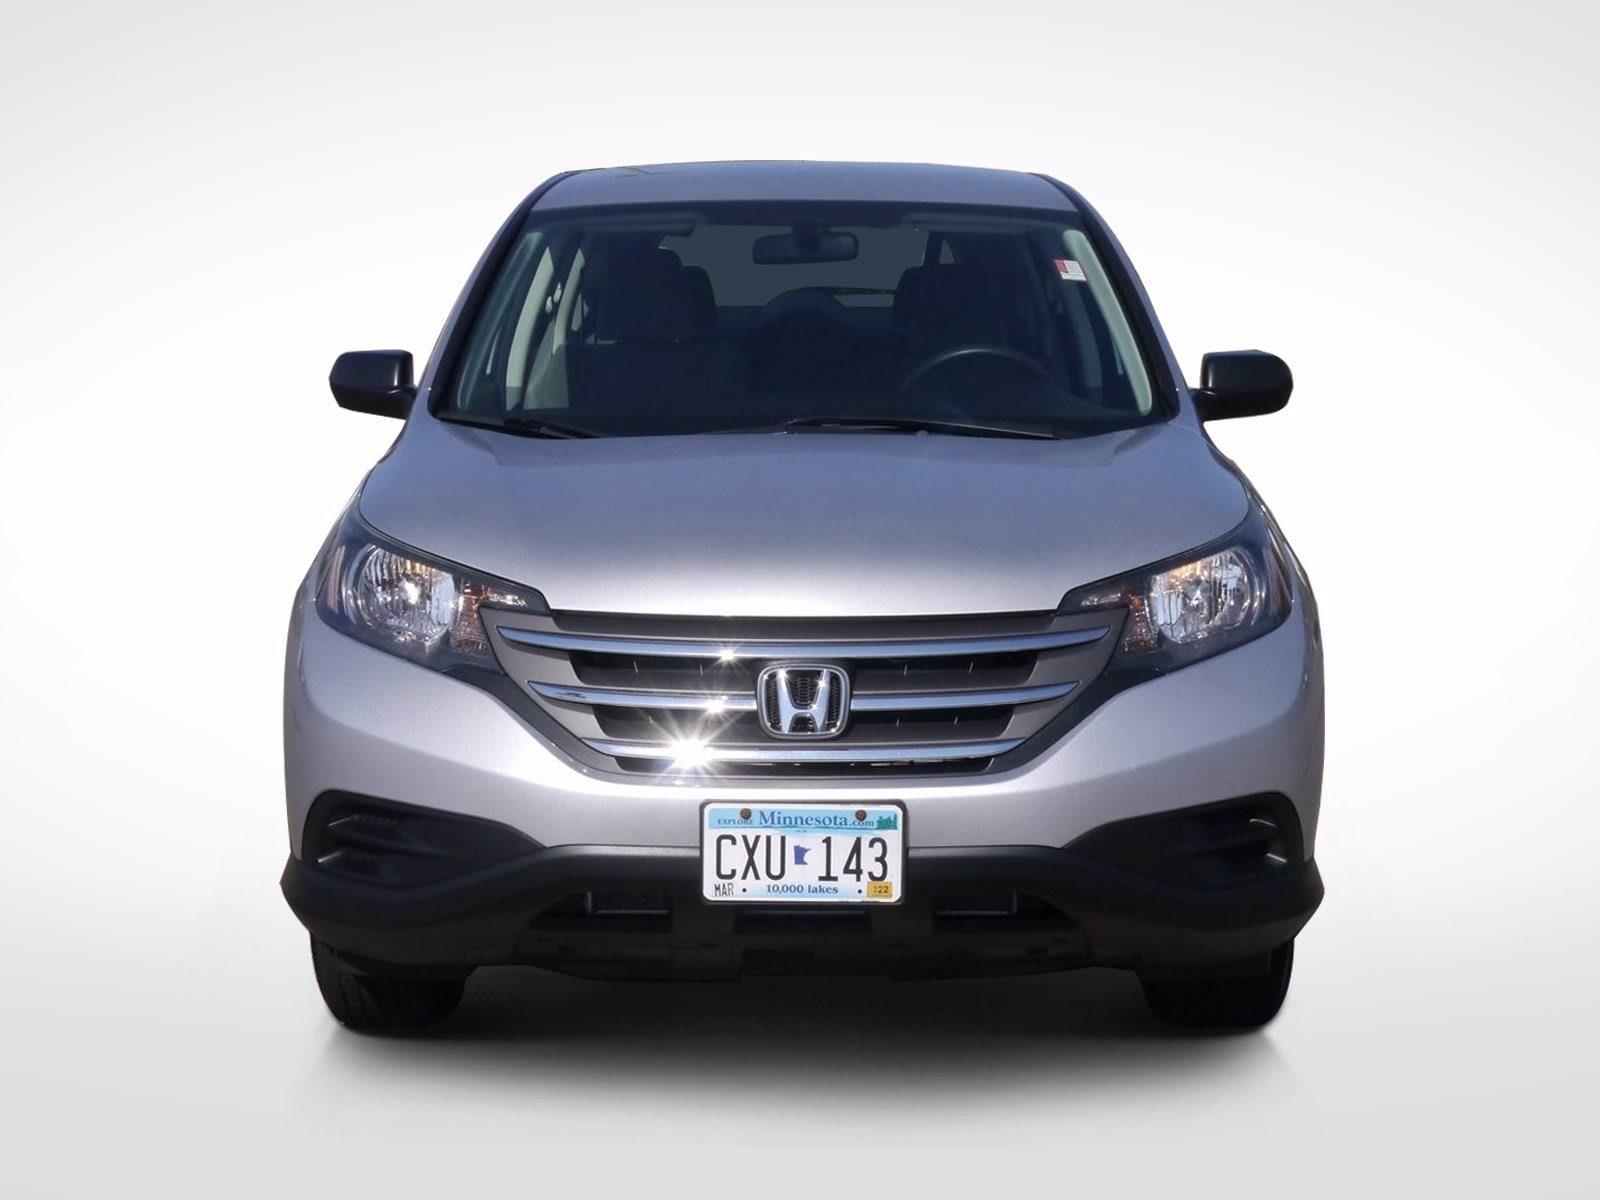 Used 2014 Honda CR-V LX with VIN 5J6RM4H39EL039994 for sale in Baxter, Minnesota